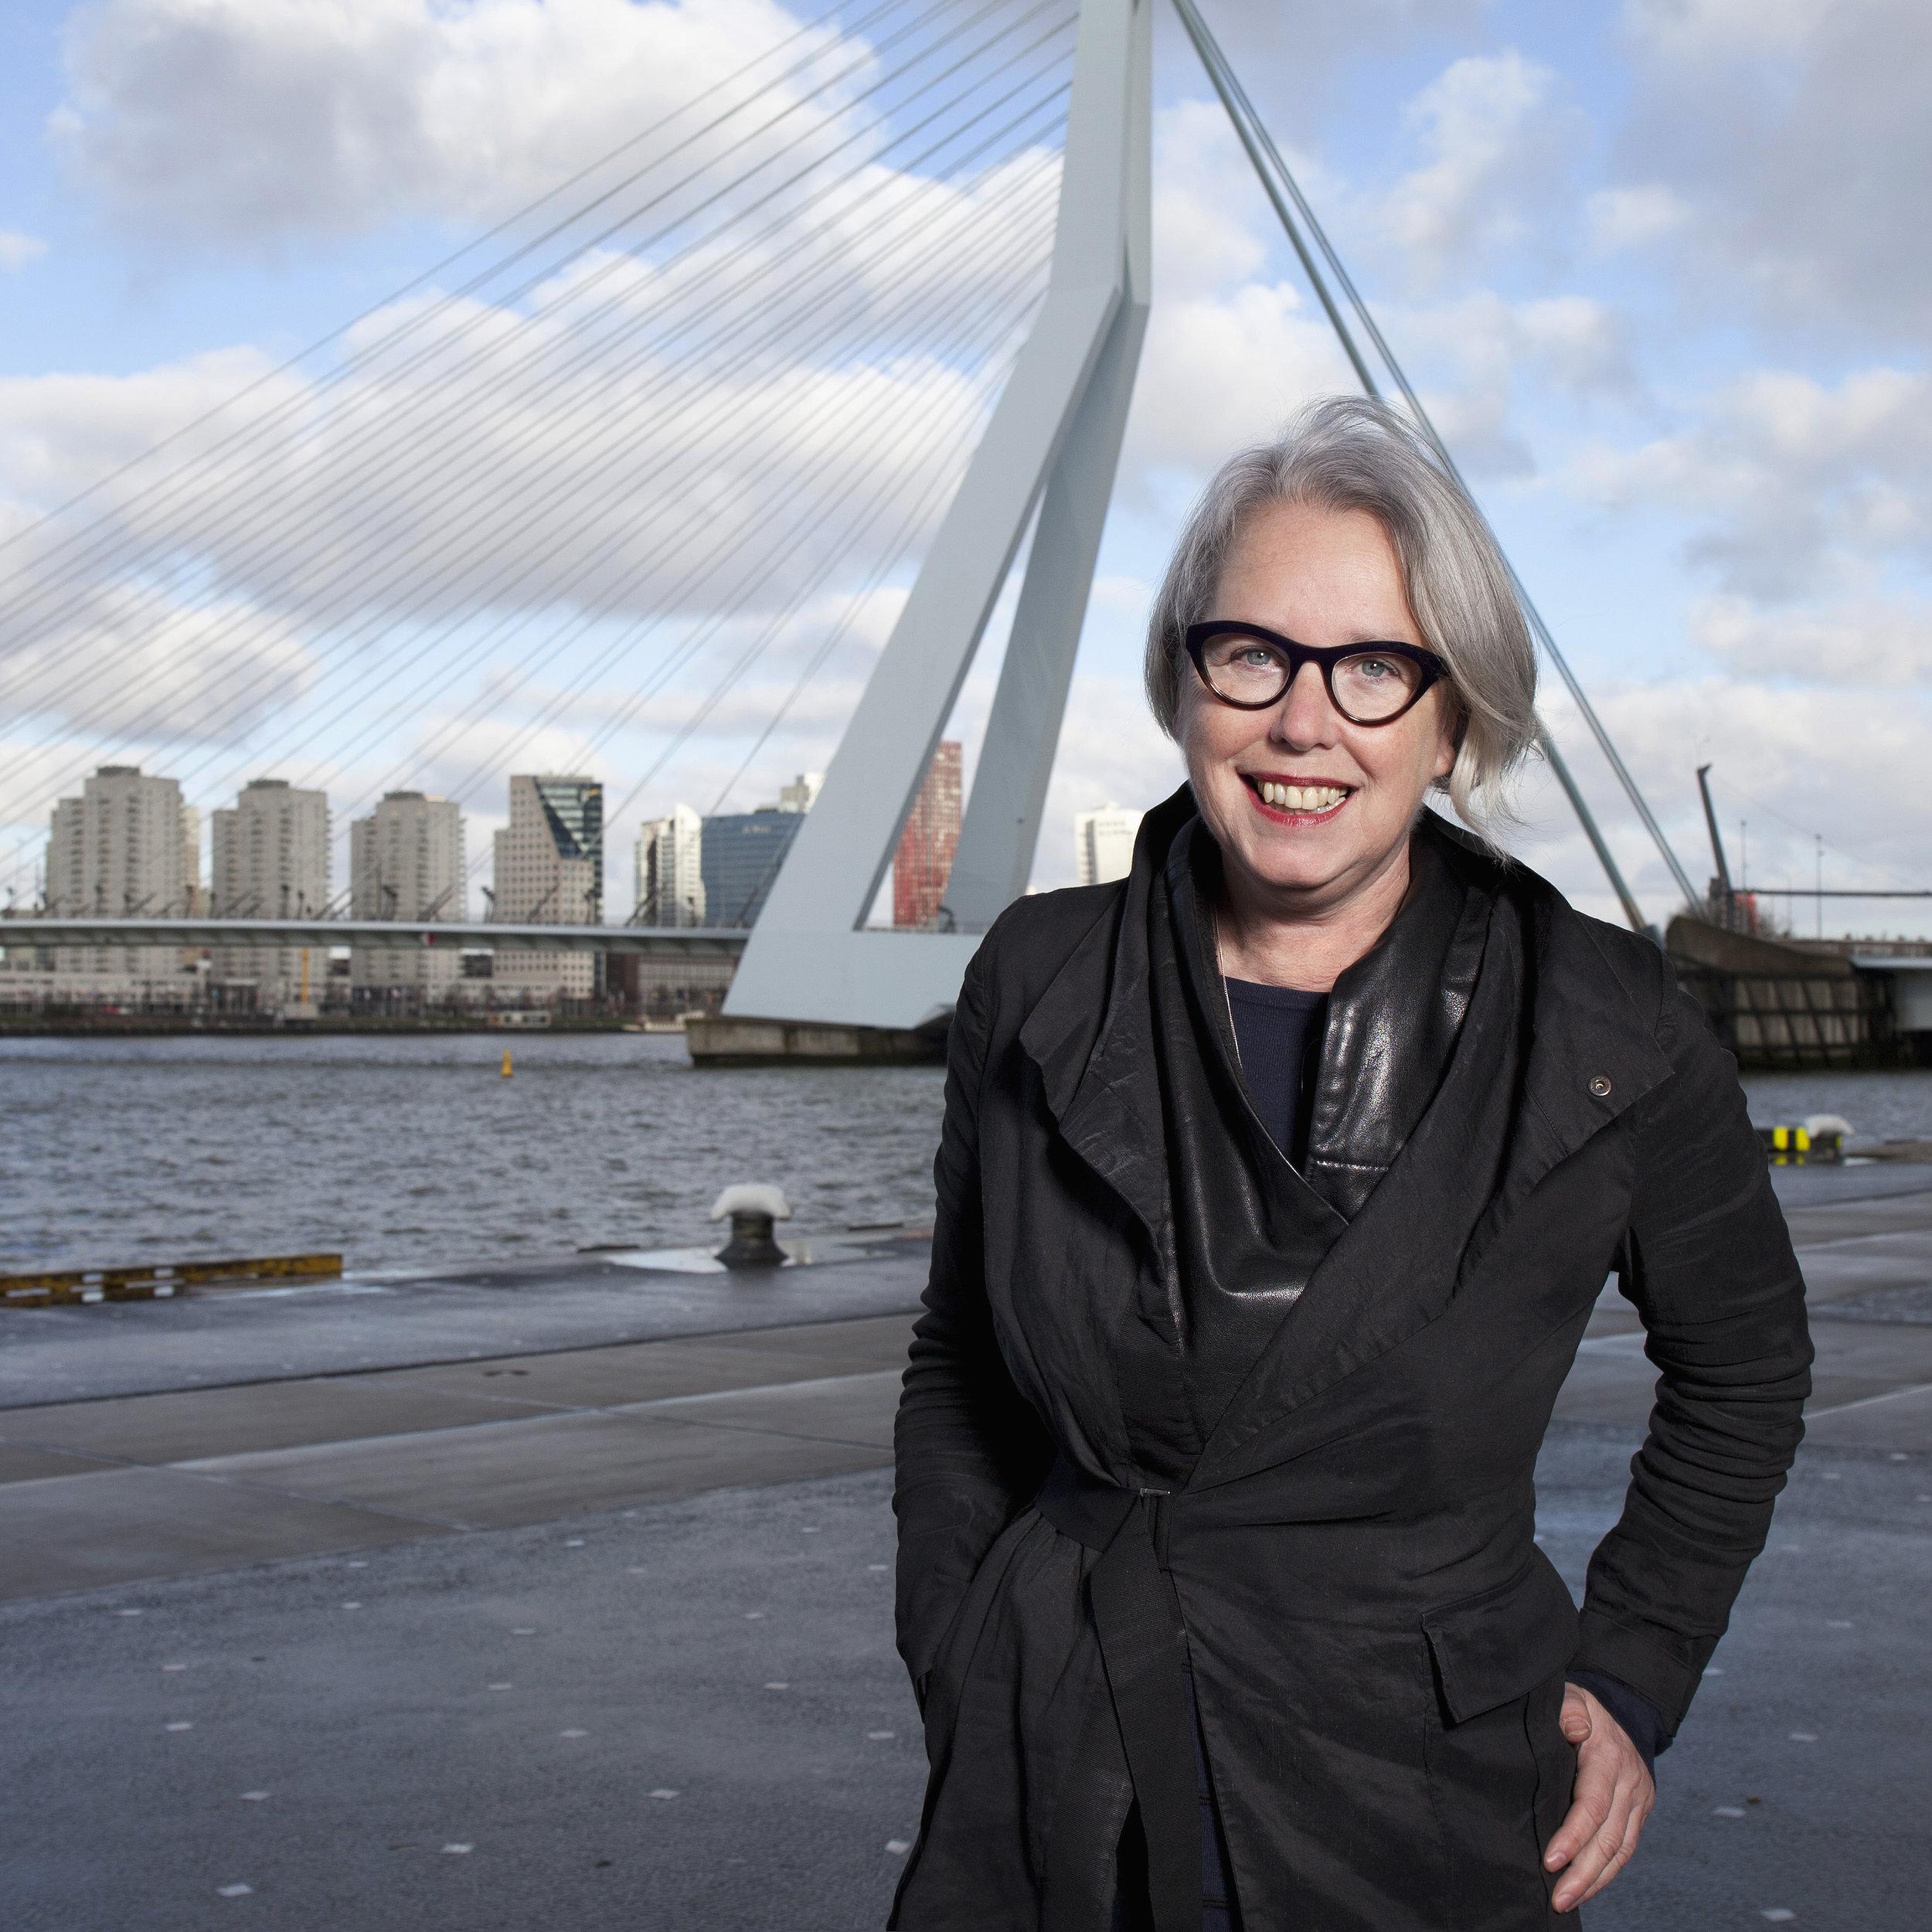 Sjouk Hoitsma   secretaris   info@textielcommissie.nl    Conservator/curator Museum Rotterdam en freelance curator mode, kostuum en textiel.